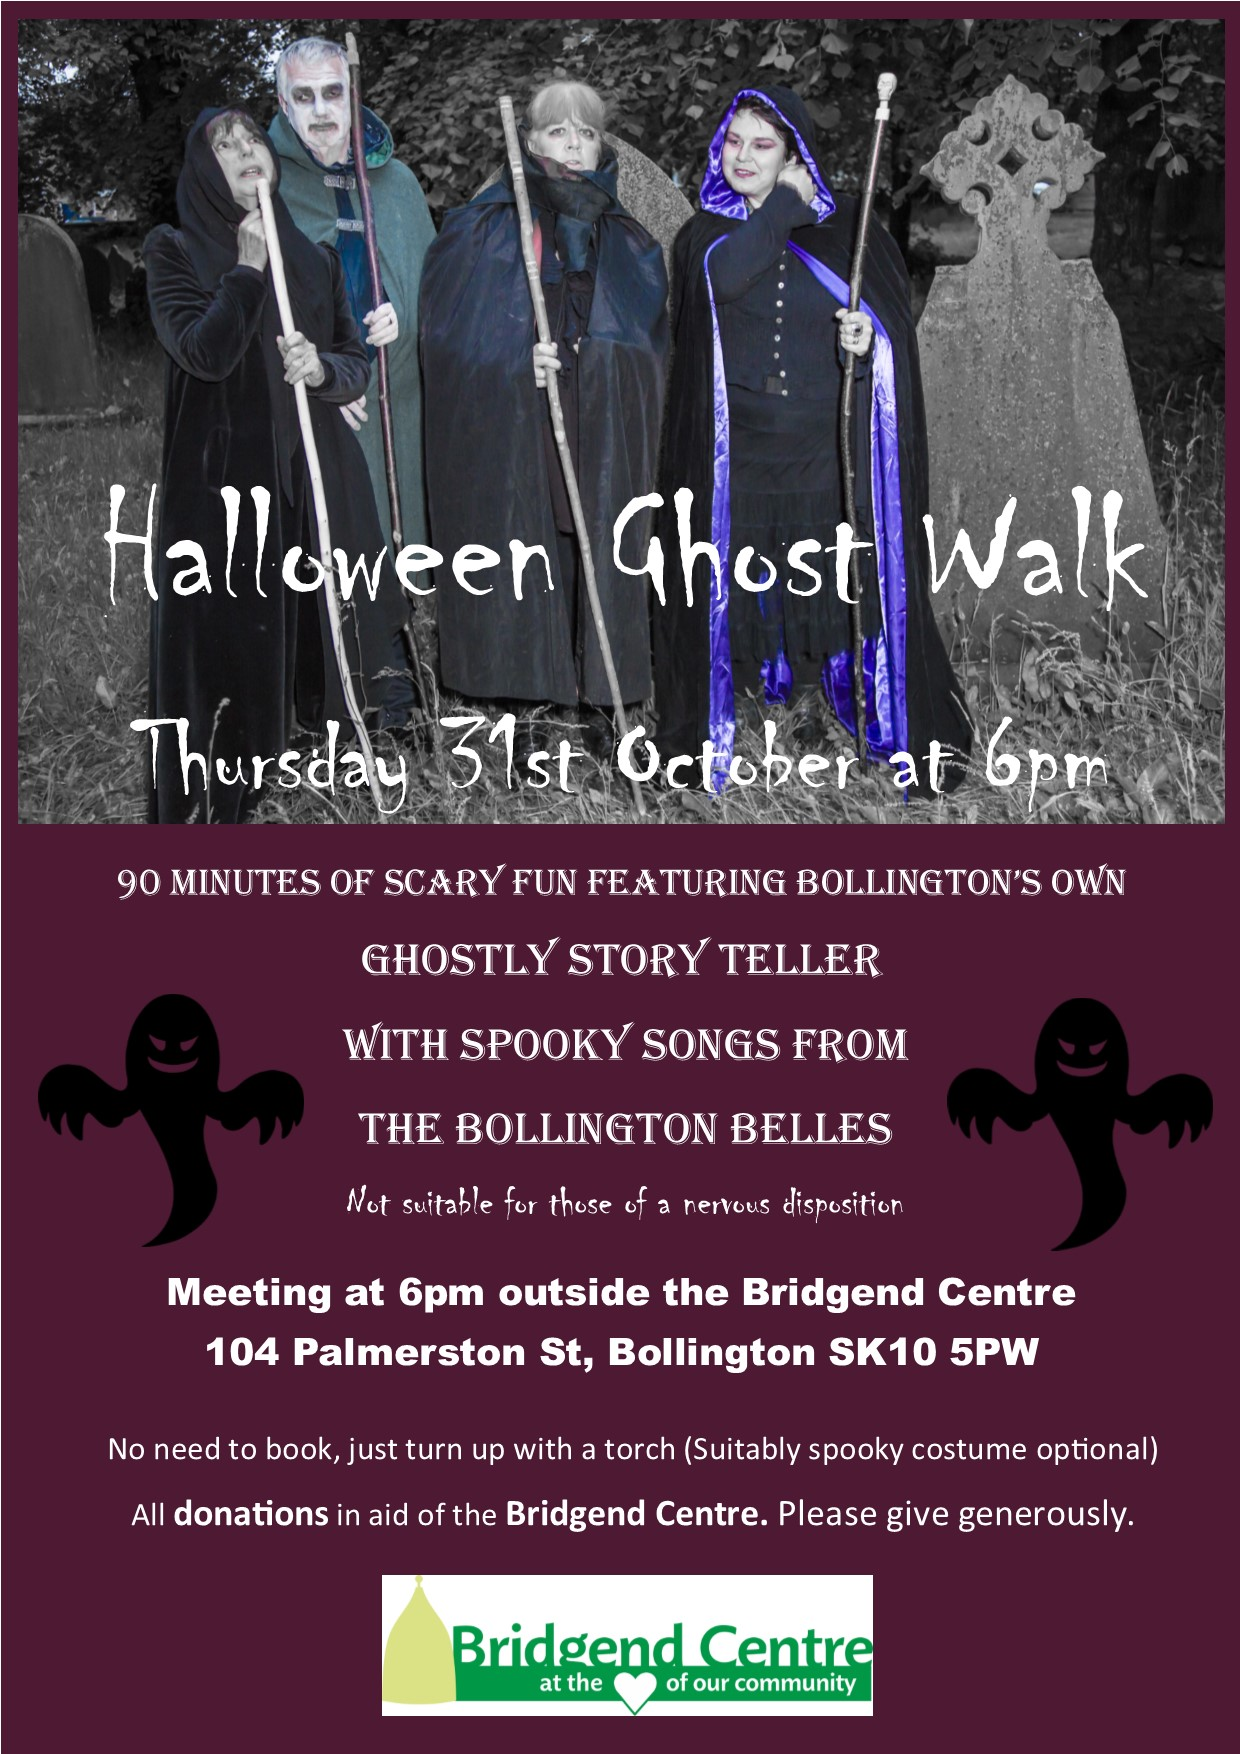 Halloween Ghost Walk